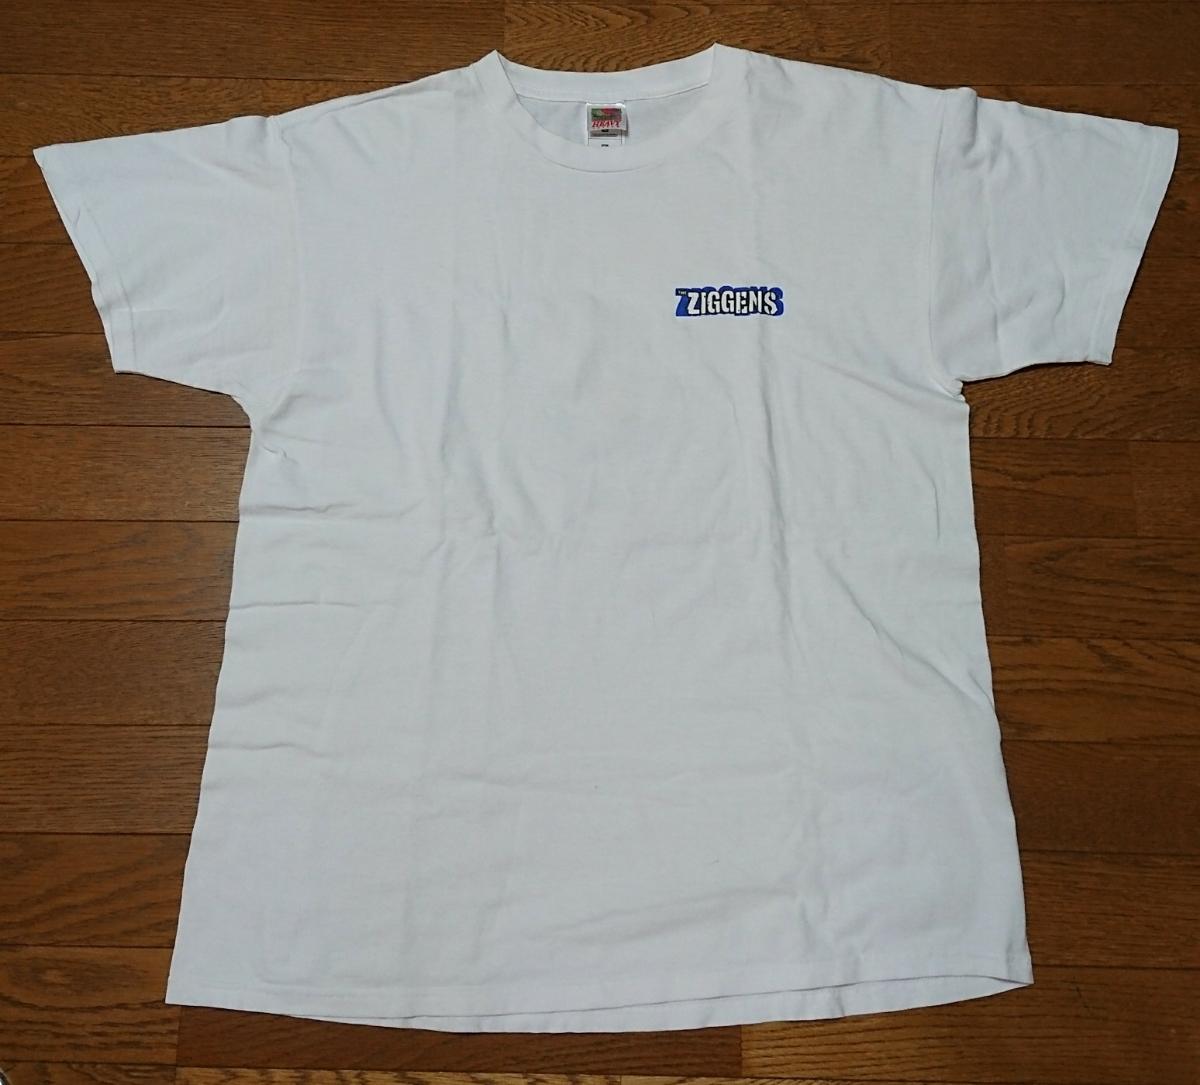 the ziggens Tシャツ XL USED ジギンズ / SUBLIME SKUNK slightly stoopid LONG BEACH DUB ALLSTARS jack johnson red hot chili peppers_画像1